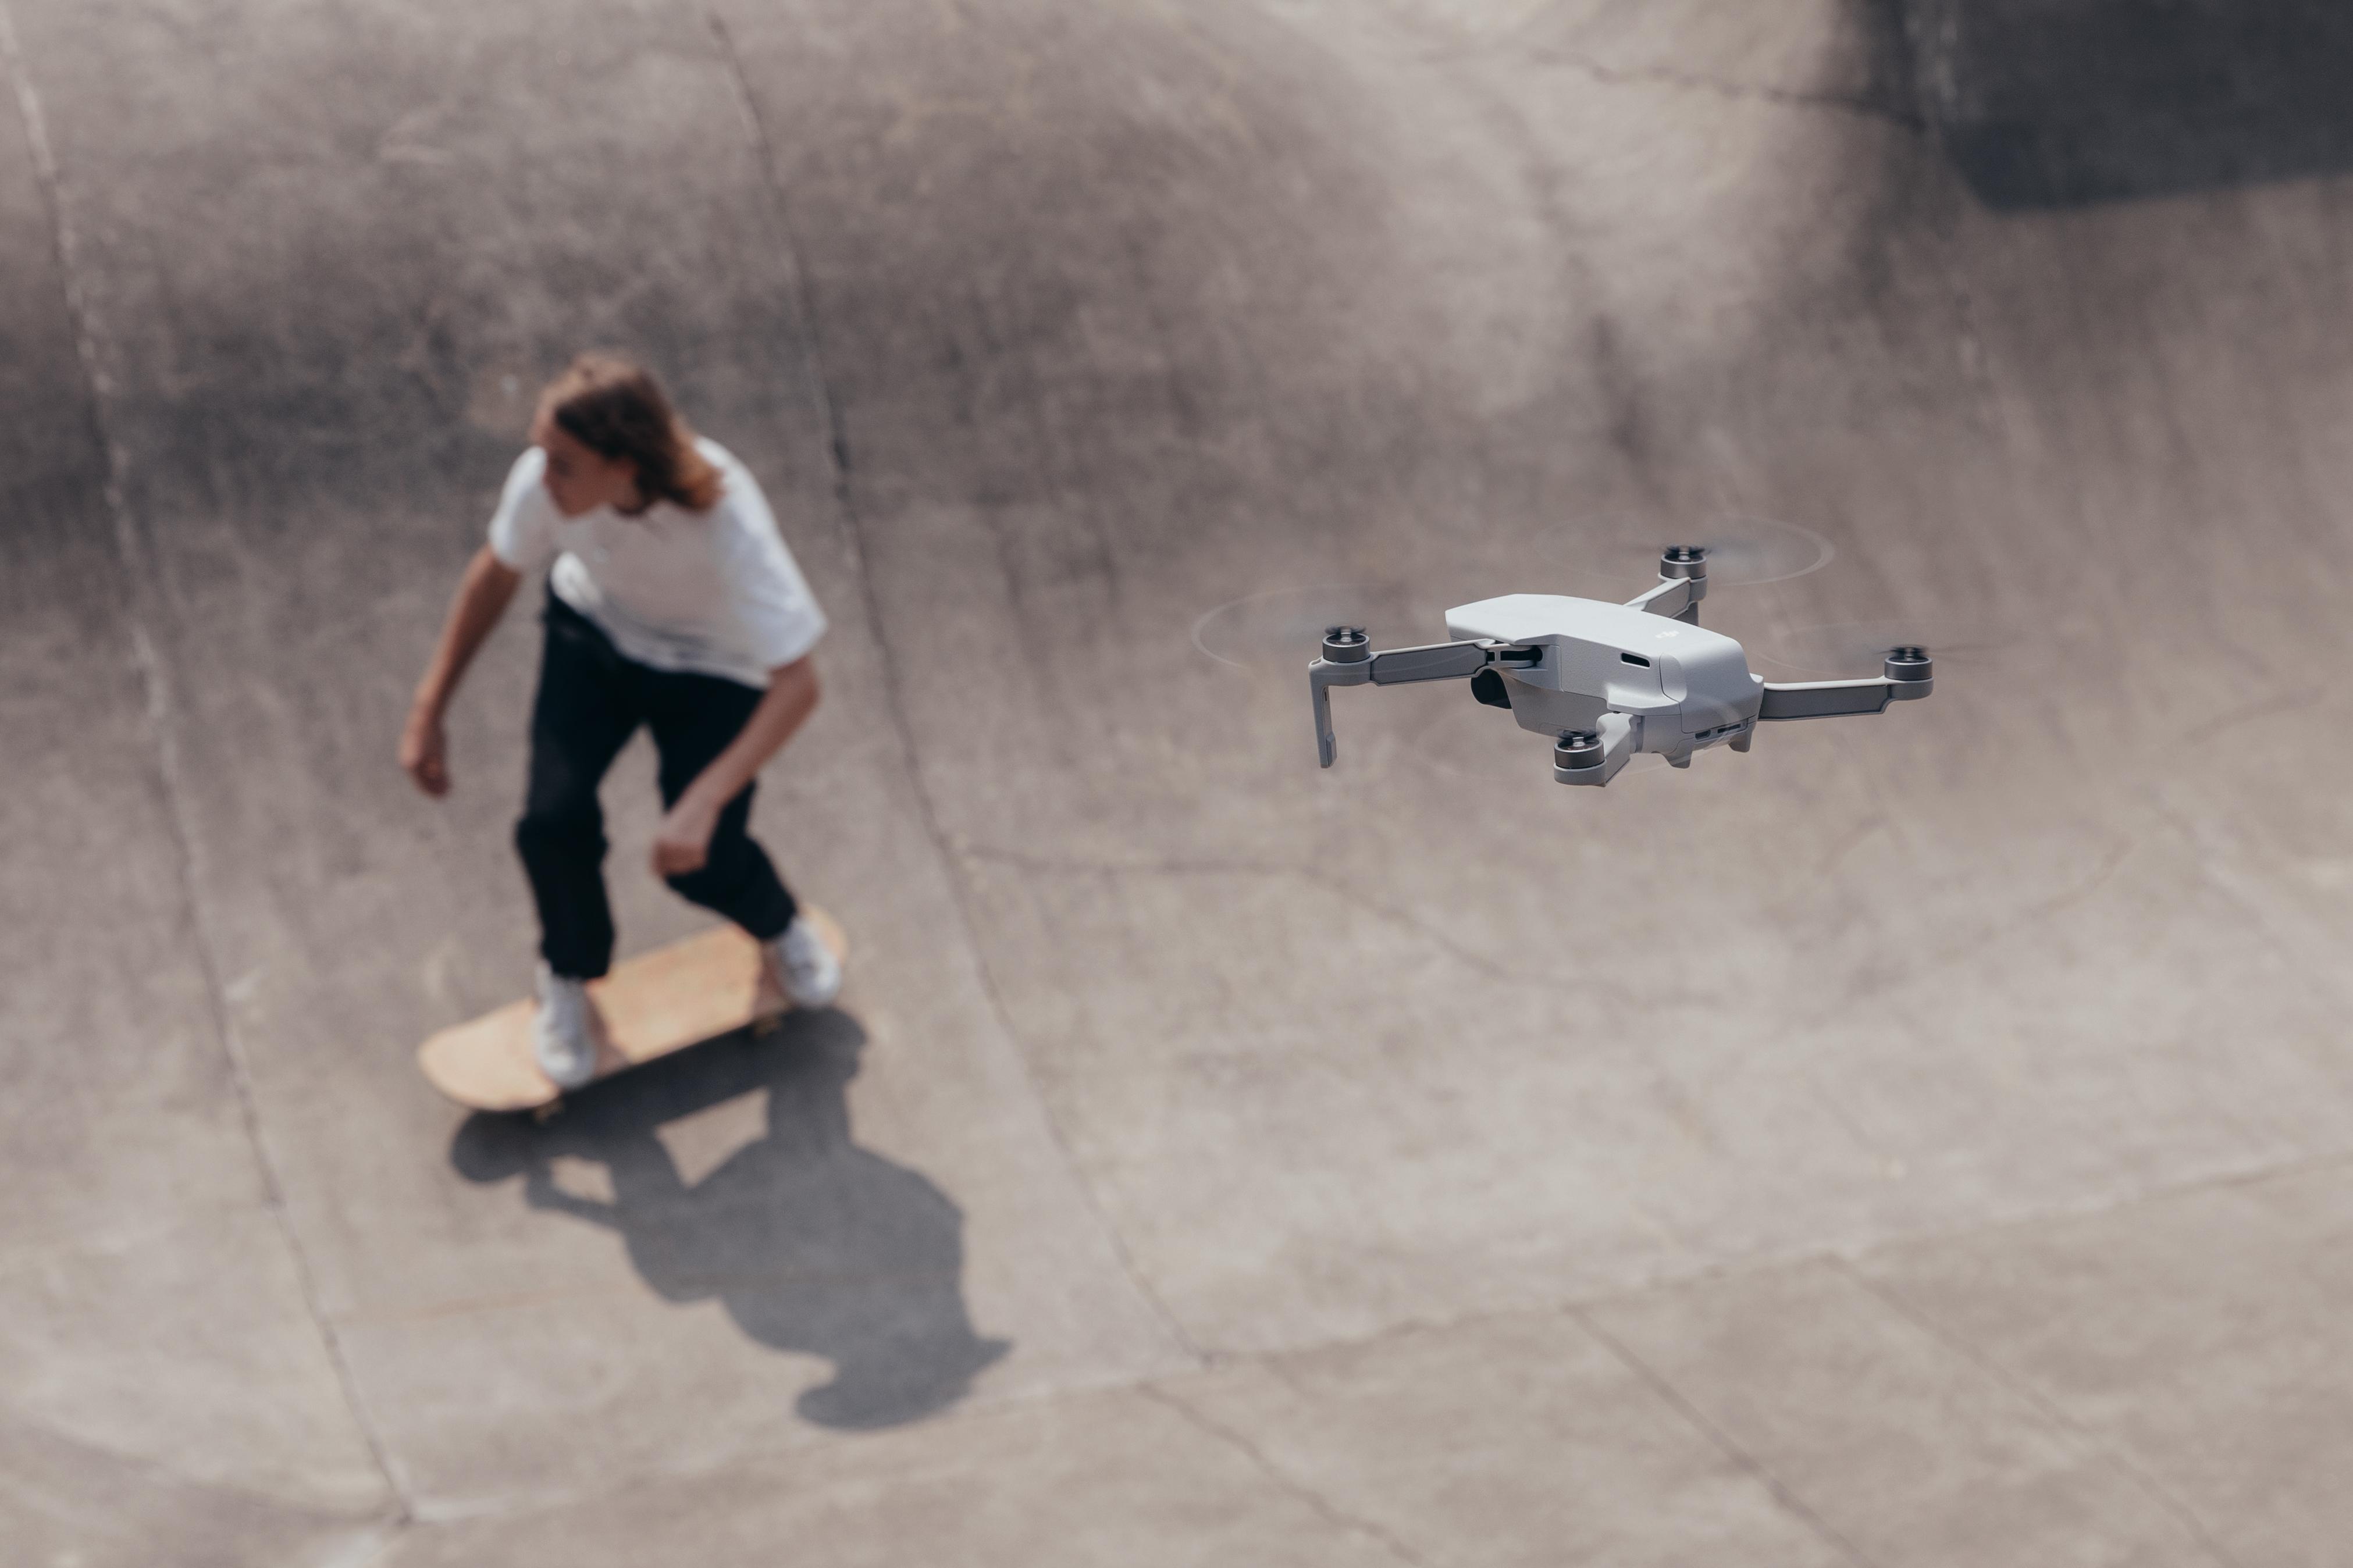 Mavic Mini shooting skateboarder